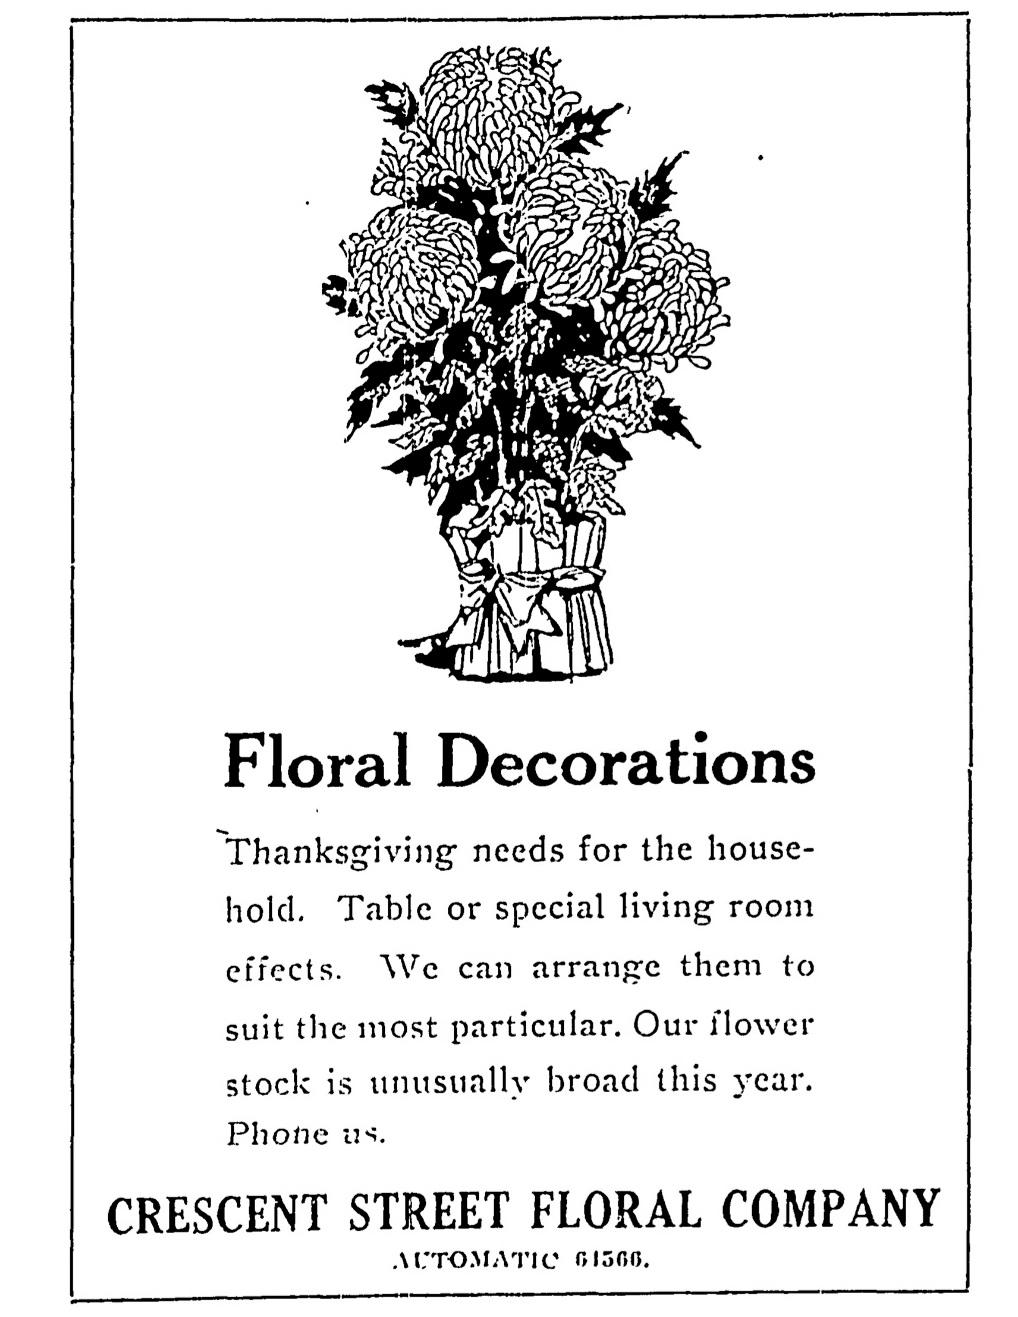 1924 advertisement